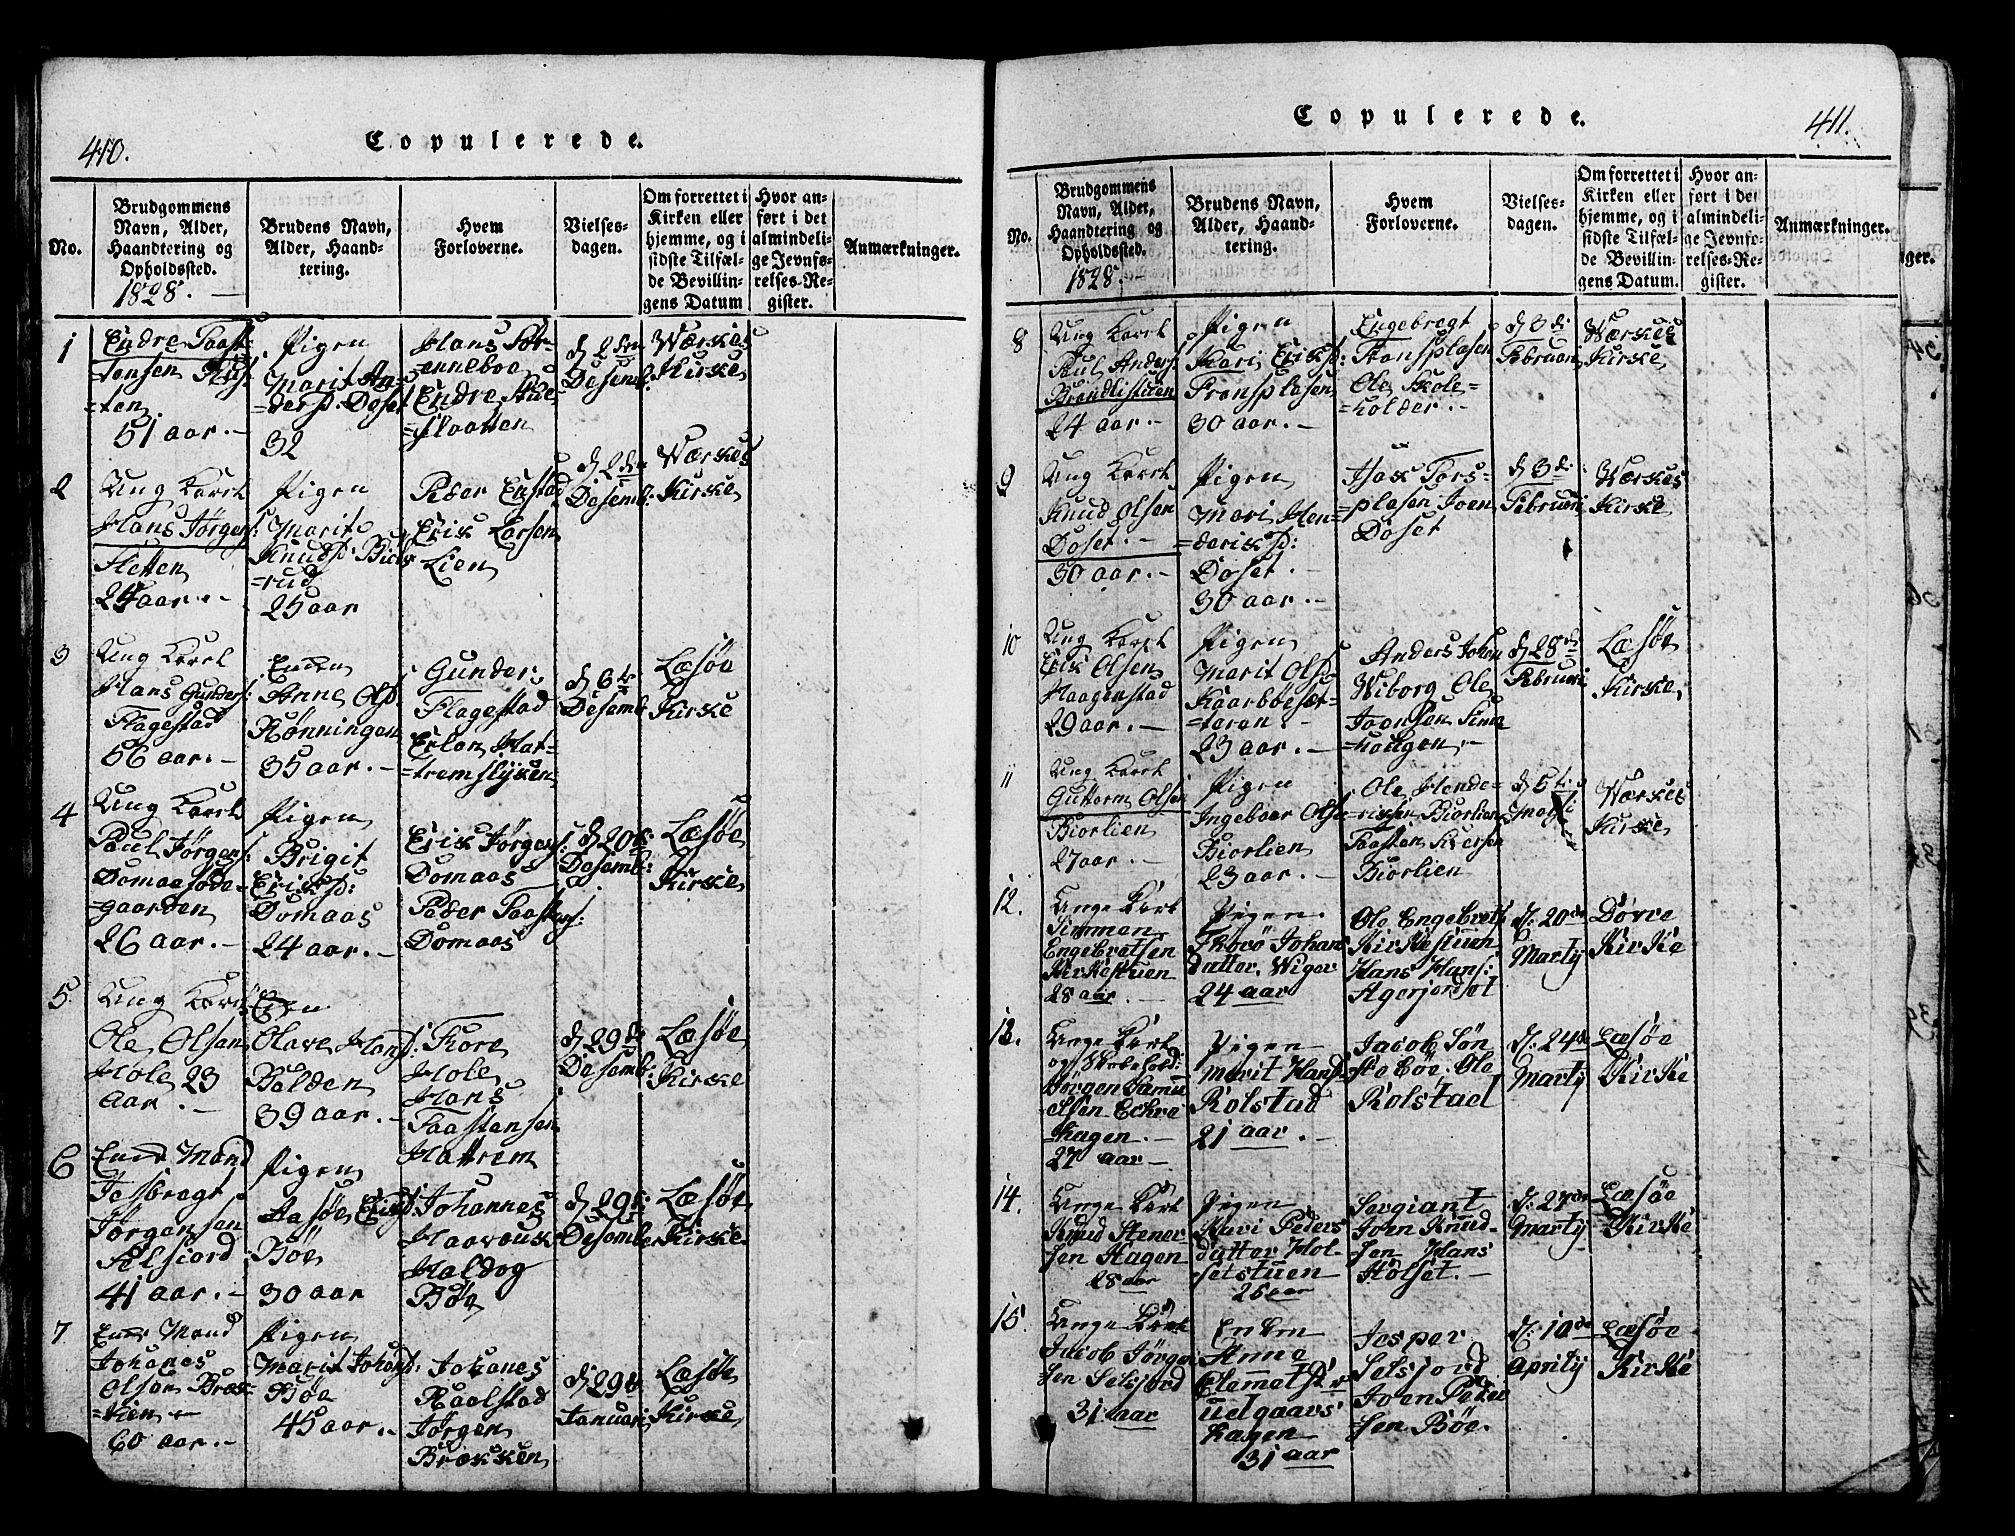 SAH, Lesja prestekontor, Klokkerbok nr. 1, 1820-1831, s. 410-411